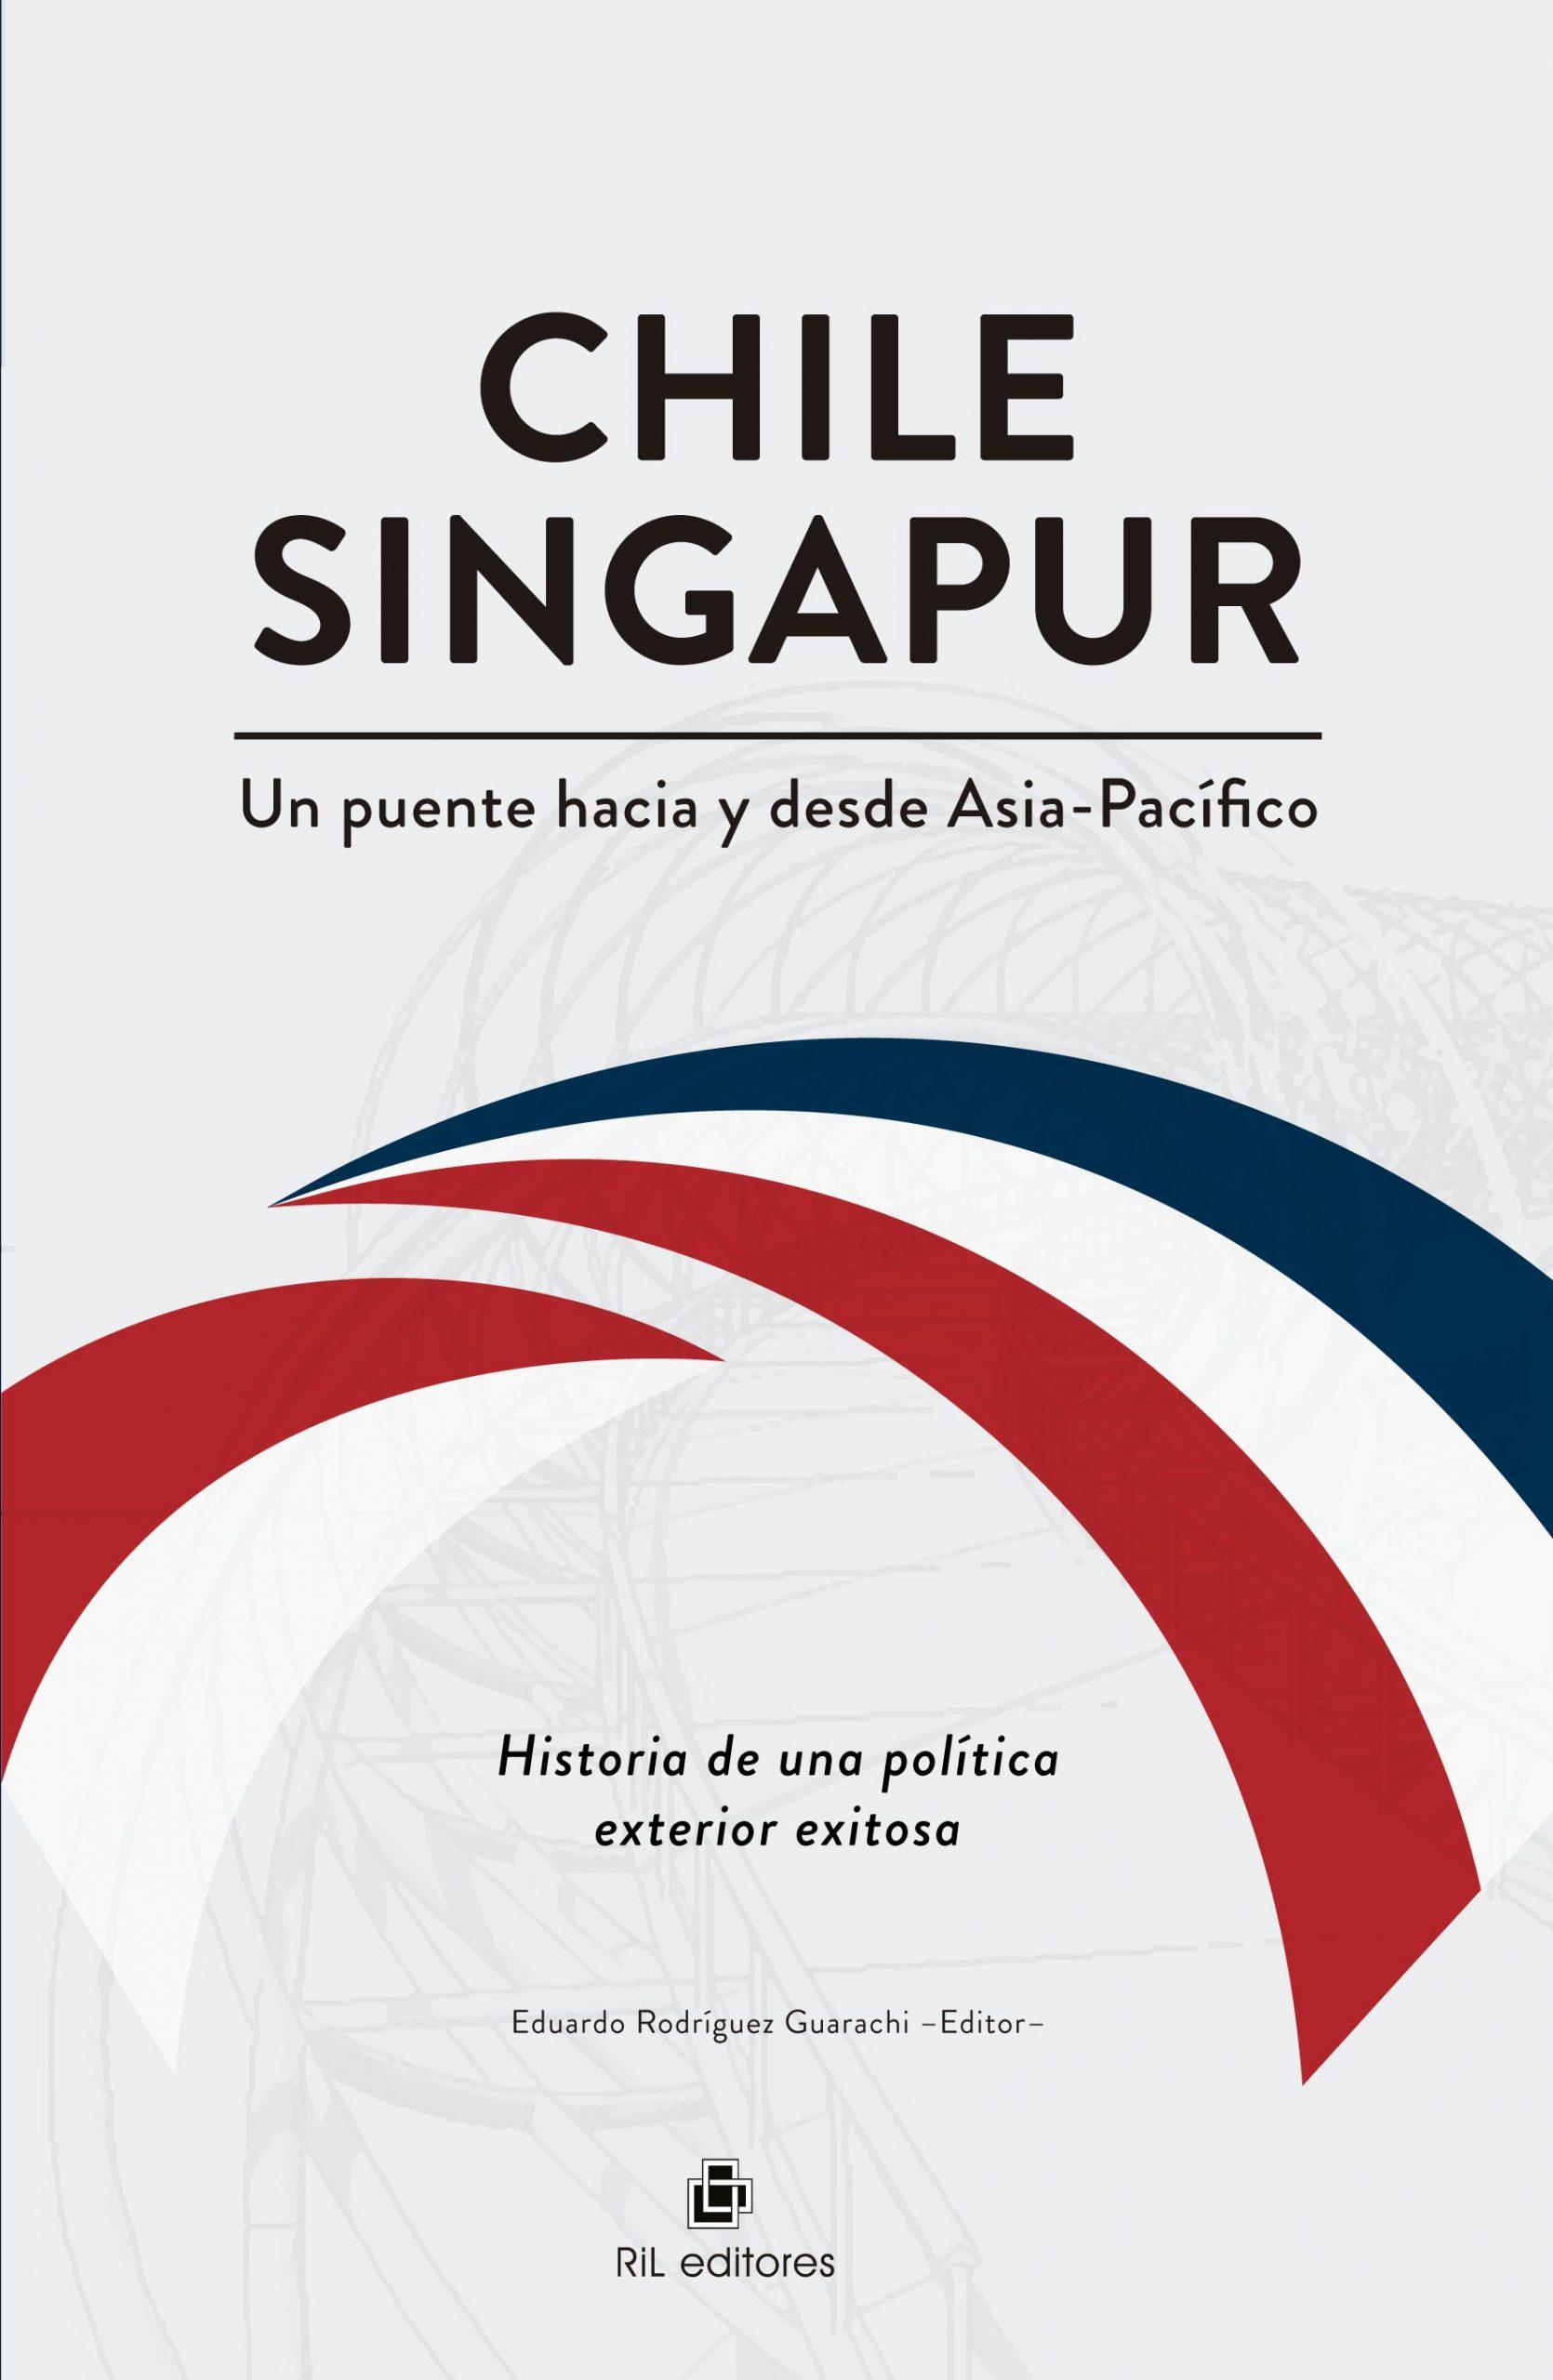 9788418065712-Rodriguez-Guarachi-Eduardo-2021-Chile-Singapur-1-scaled-1.jpg